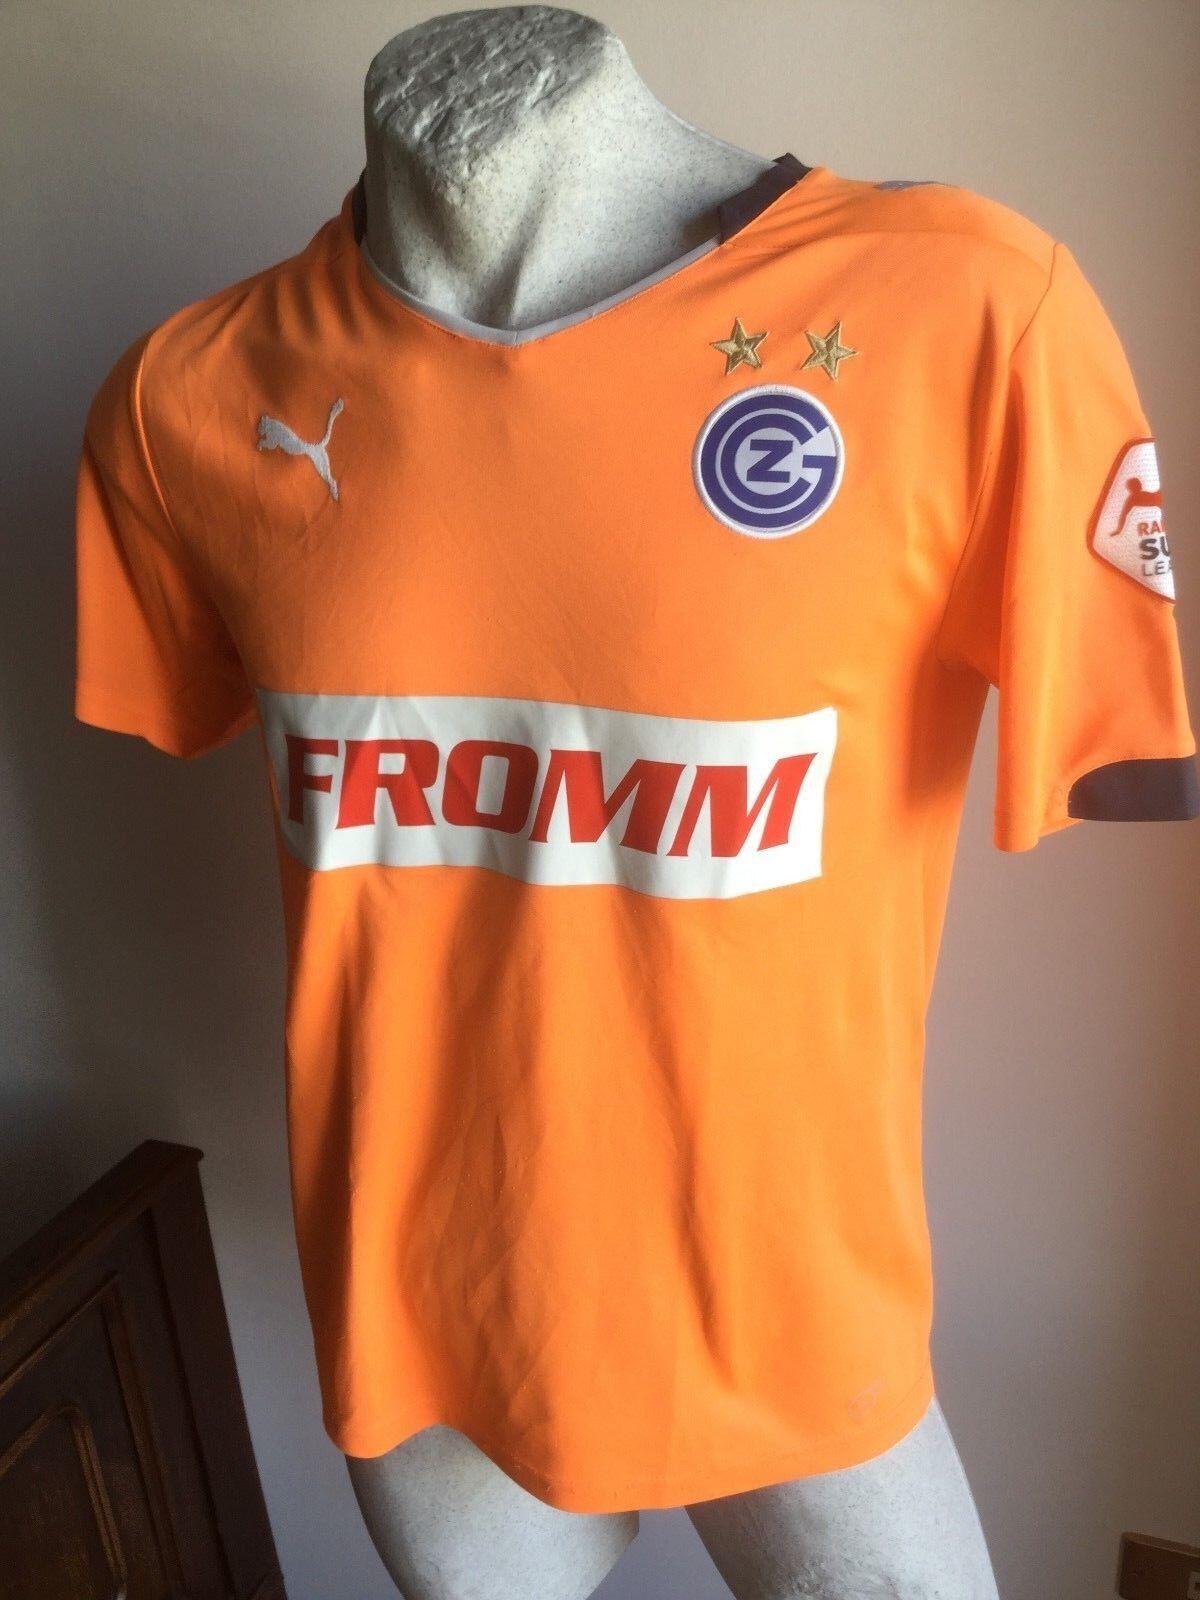 Maglia calcio Grasshoppers FROMM swiss MARC 1football shirt goalkeeper 2011